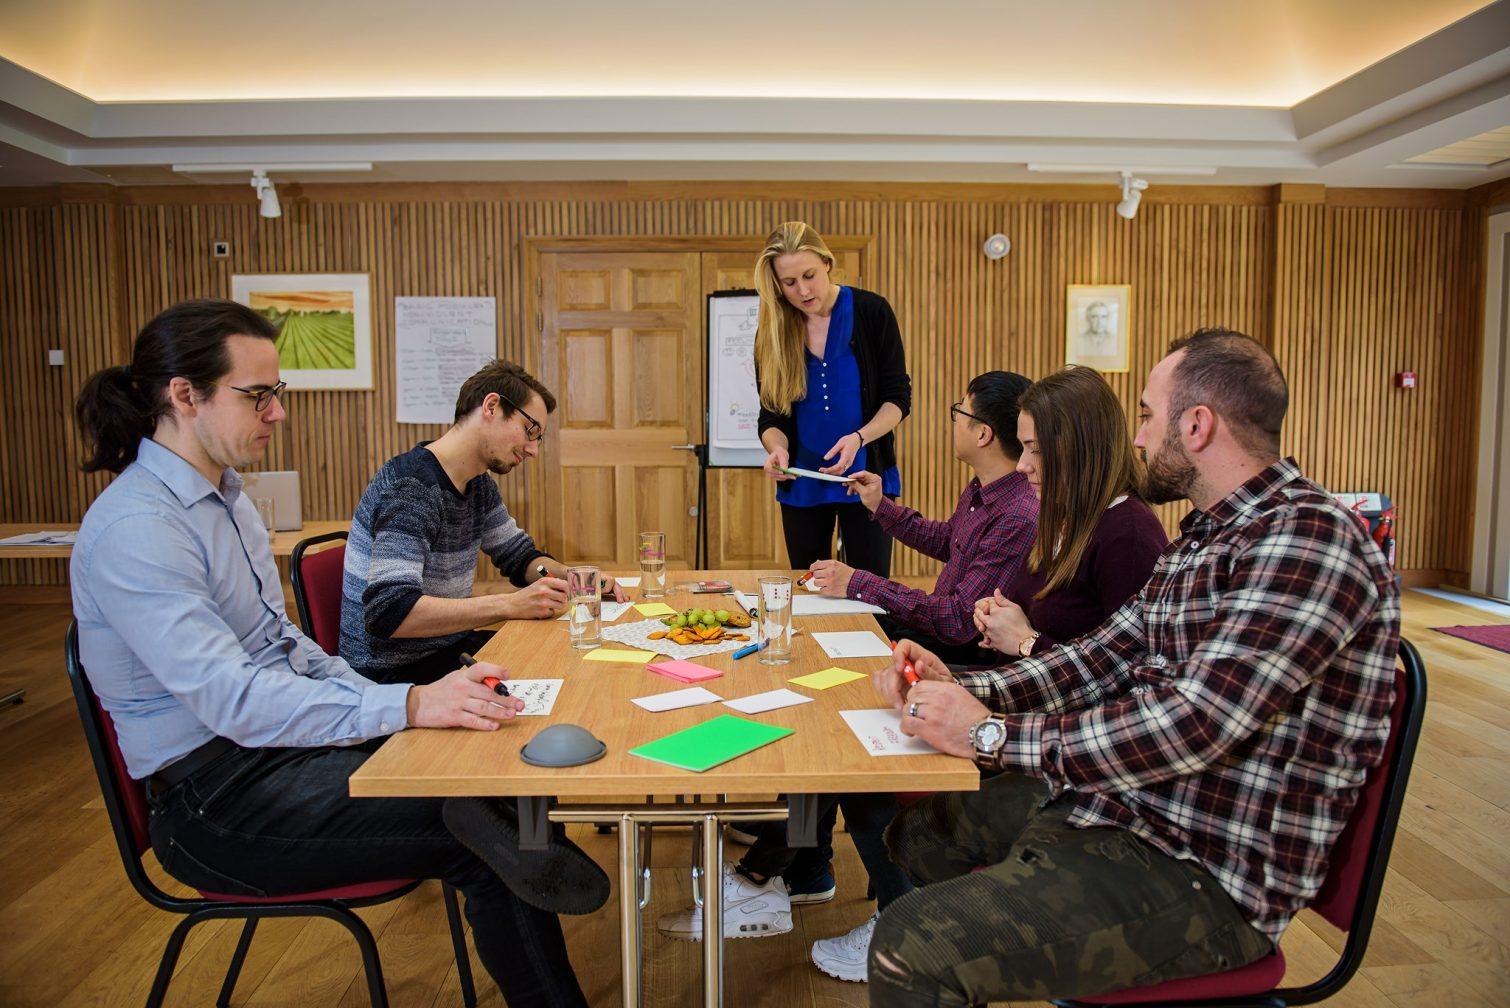 Non-violent communication workshop